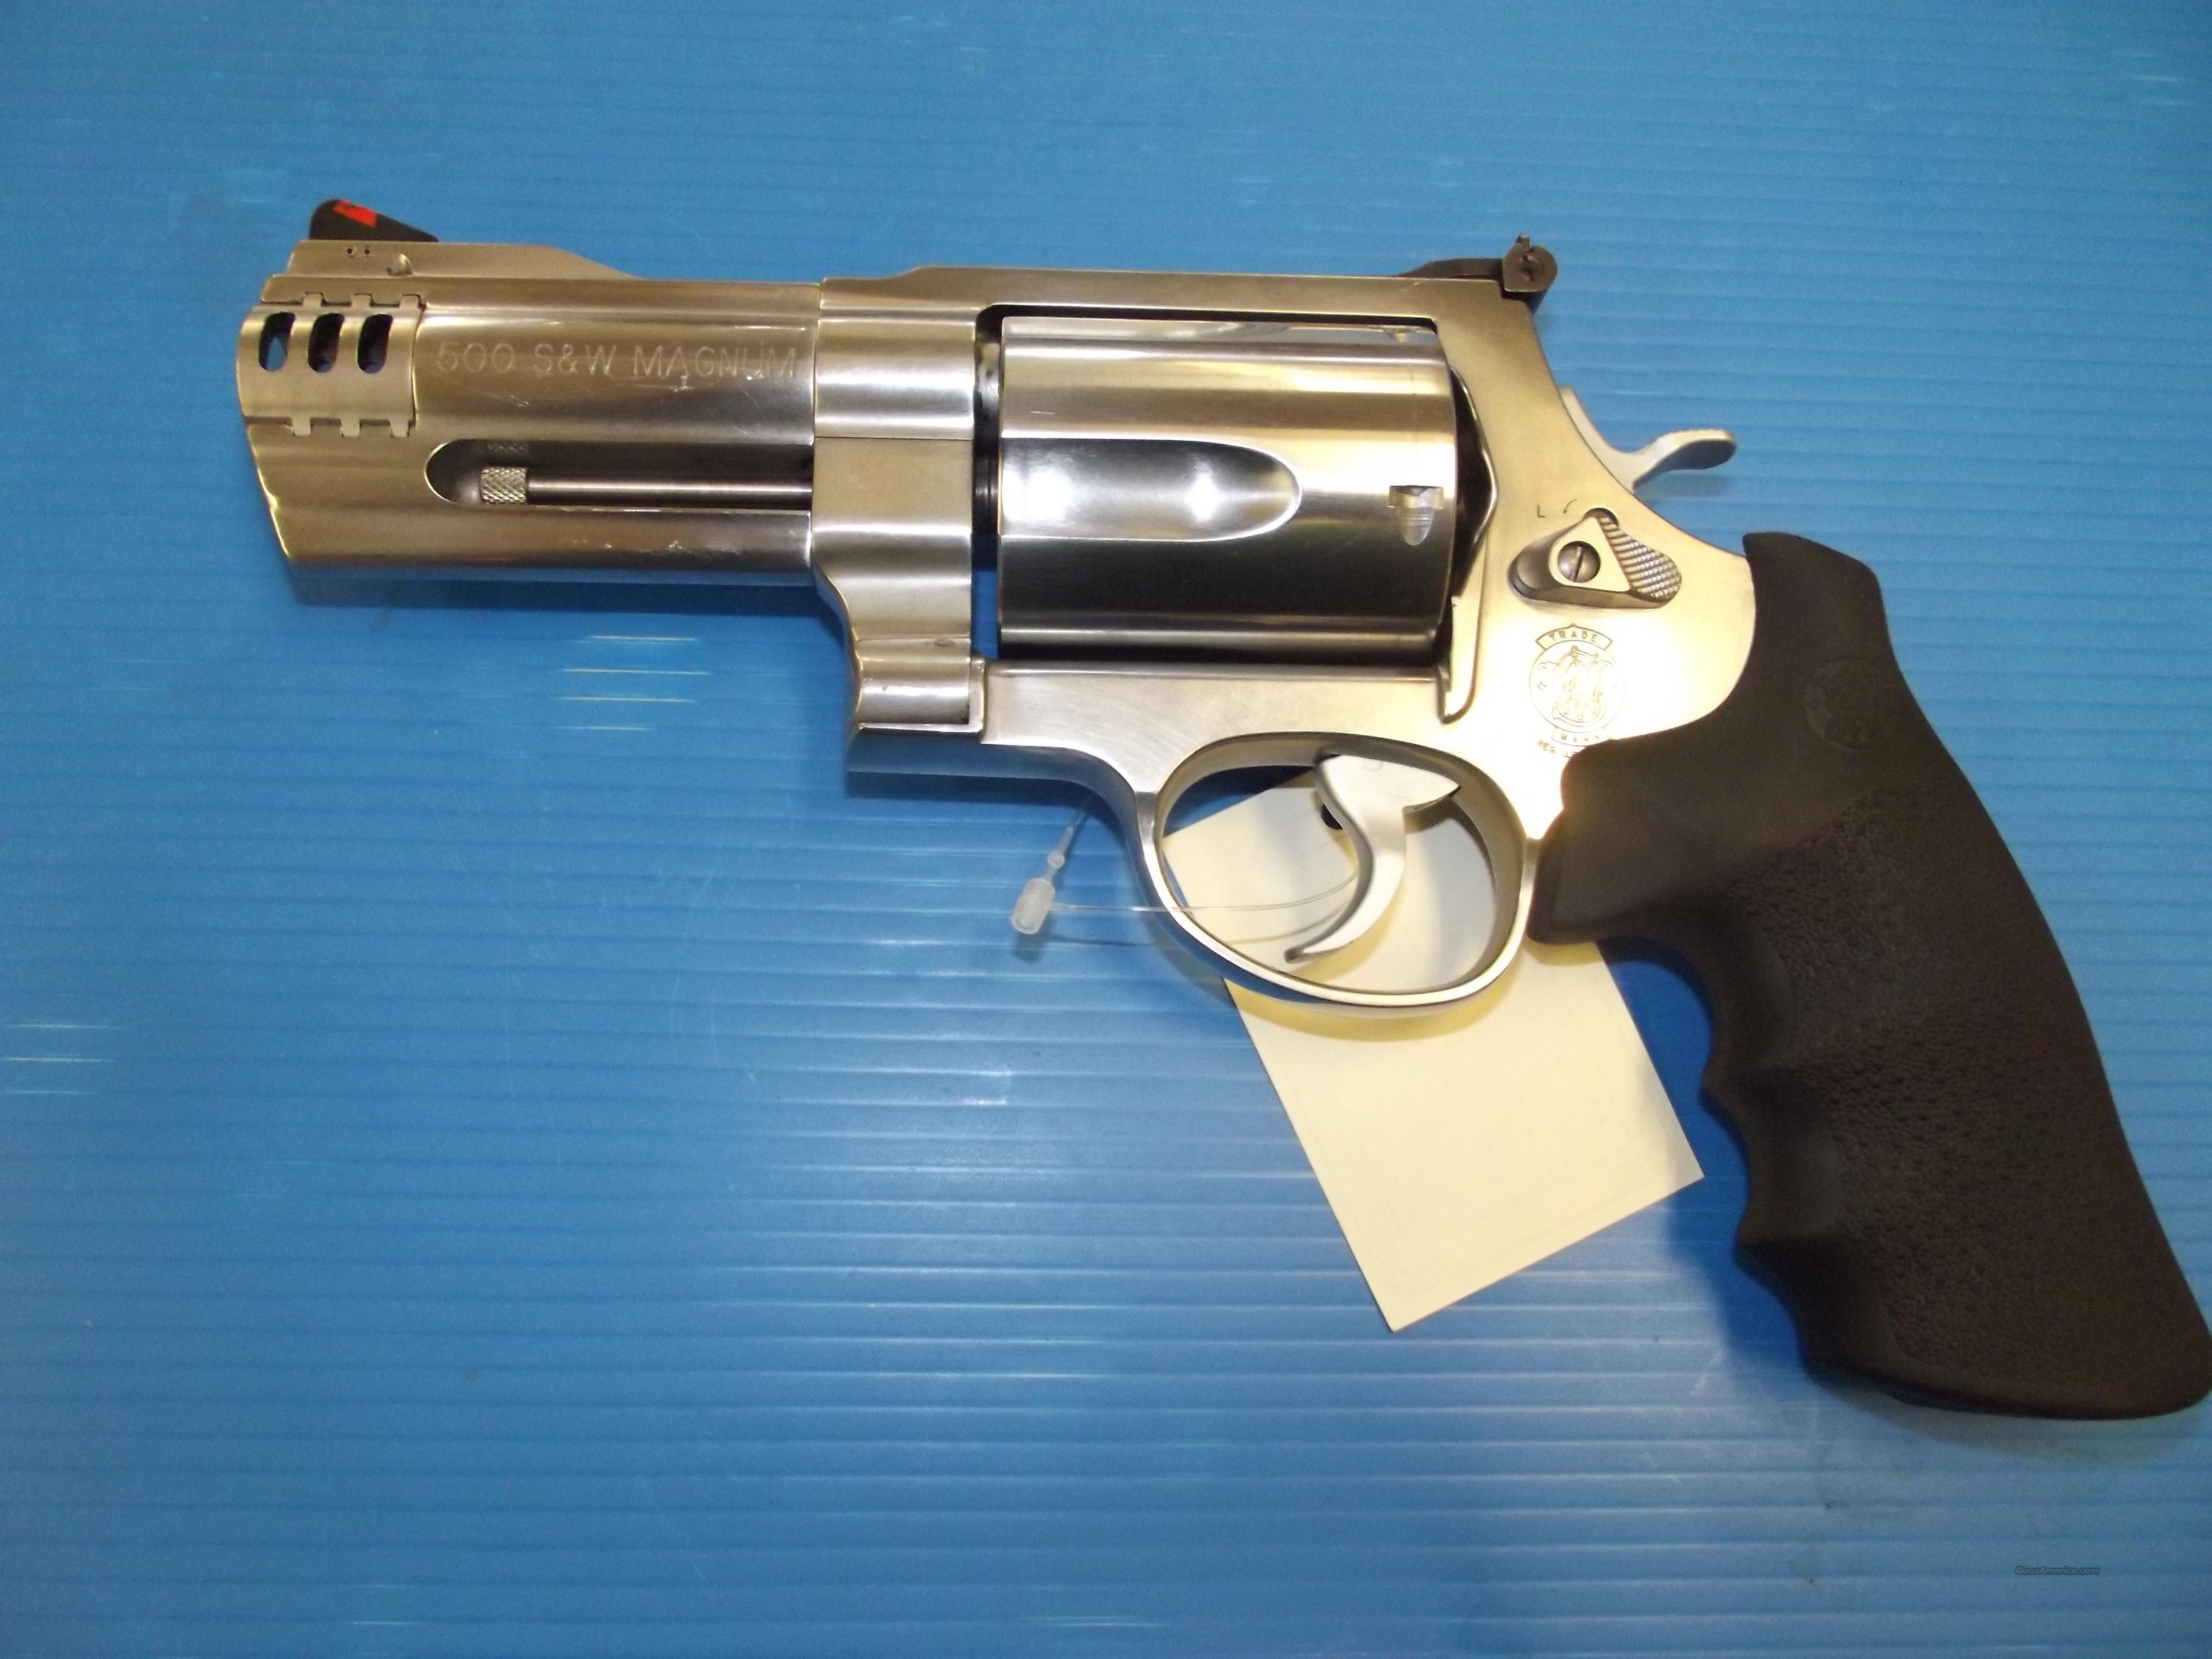 S&W 500 VV-18-1  Guns > Pistols > Smith & Wesson Revolvers > Full Frame Revolver